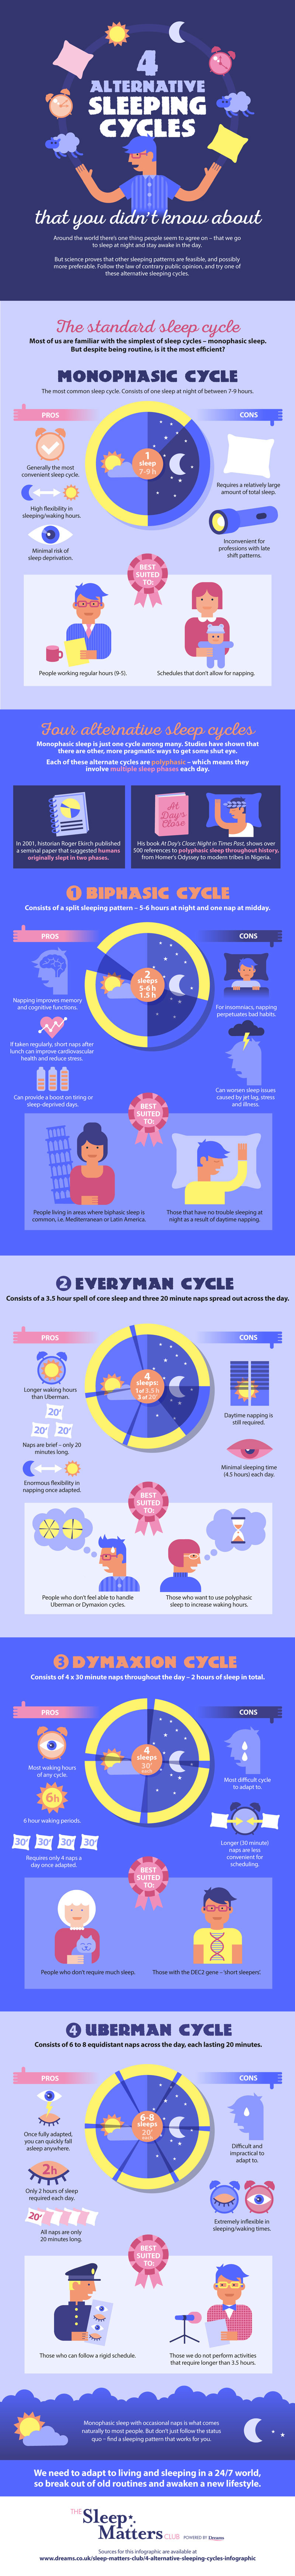 4 алтернативни шеми на спиење